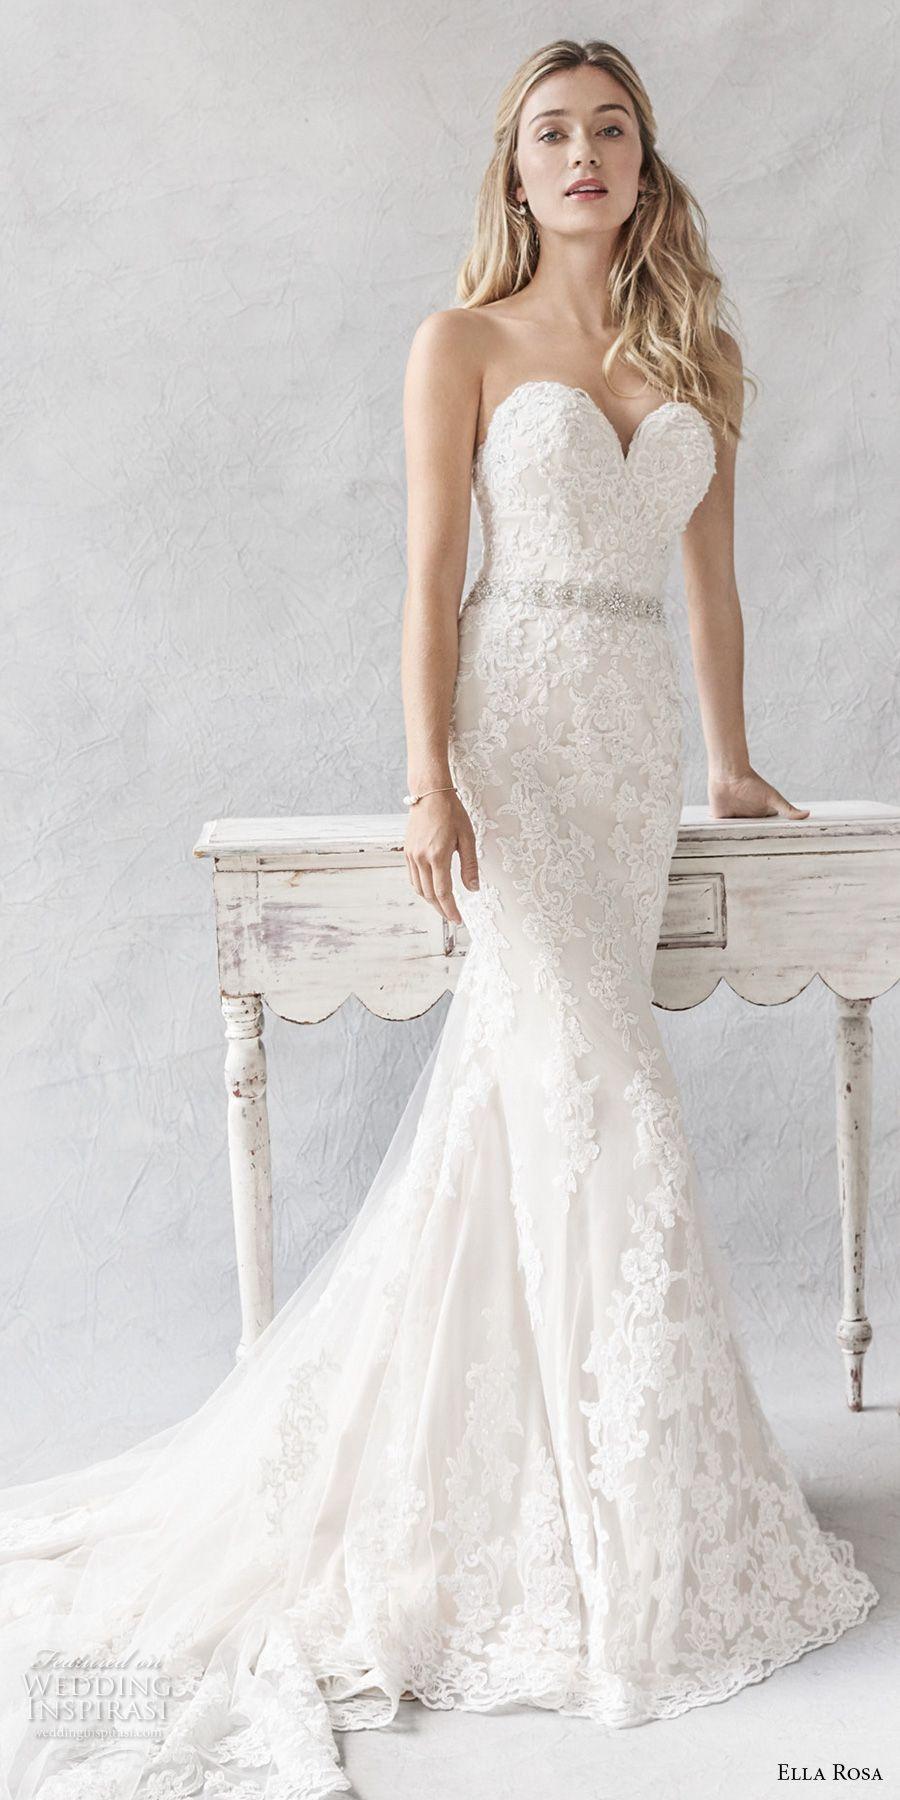 Ella Rosa Spring 2017 Wedding Dresses Wedding Inspirasi Wedding Dresses Wedding Dresses Lace Spring 2017 Wedding Dresses